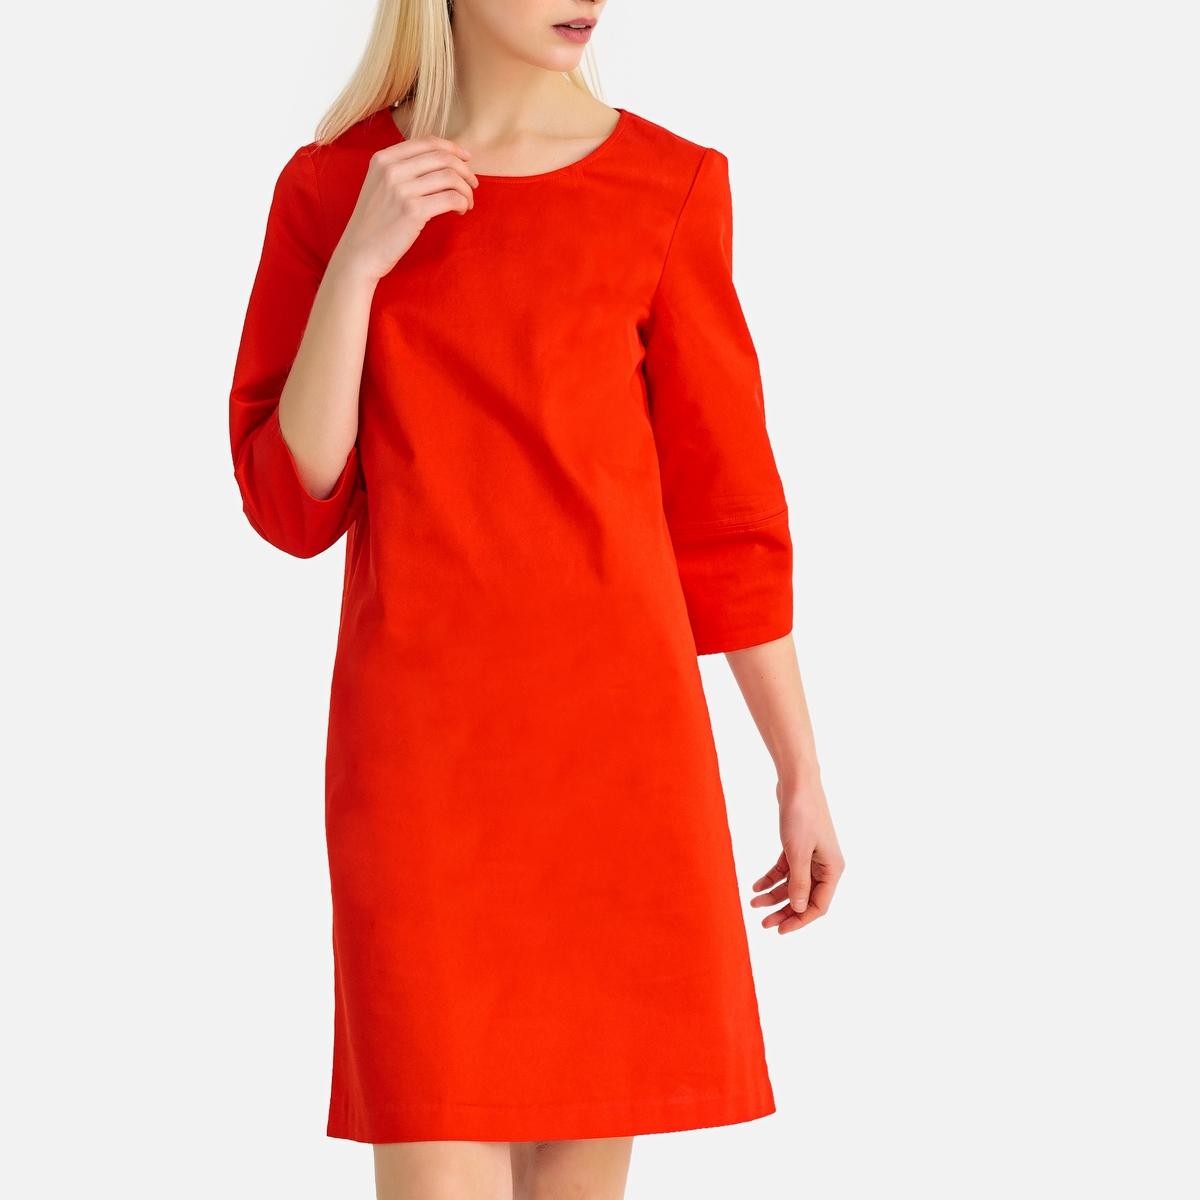 цена Платье-футляр La Redoute С рукавами длина миди 38 (FR) - 44 (RUS) оранжевый онлайн в 2017 году